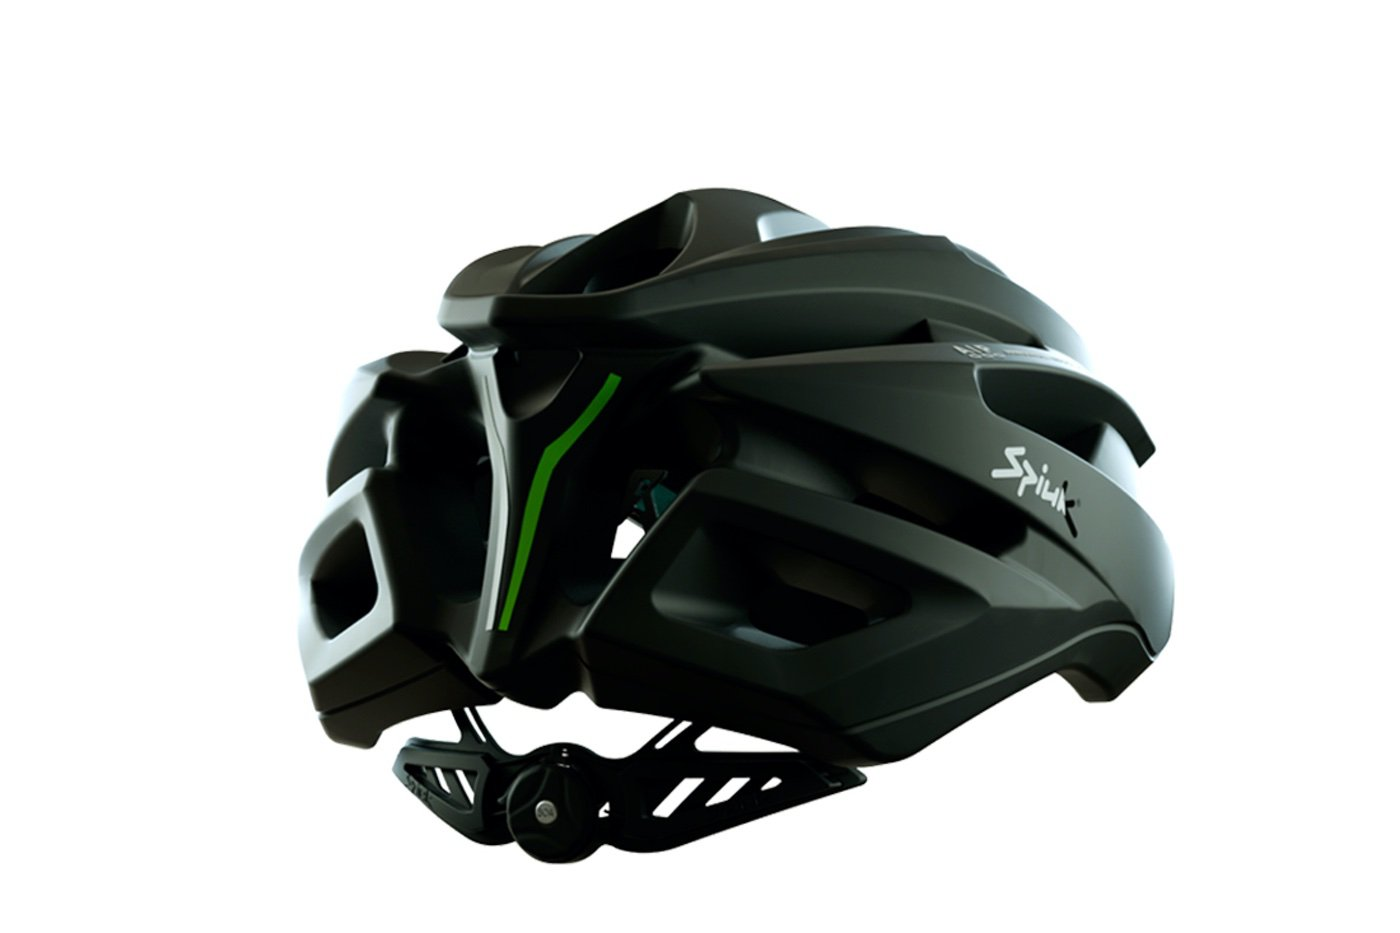 Nuevo casco Spiuk PROFIT